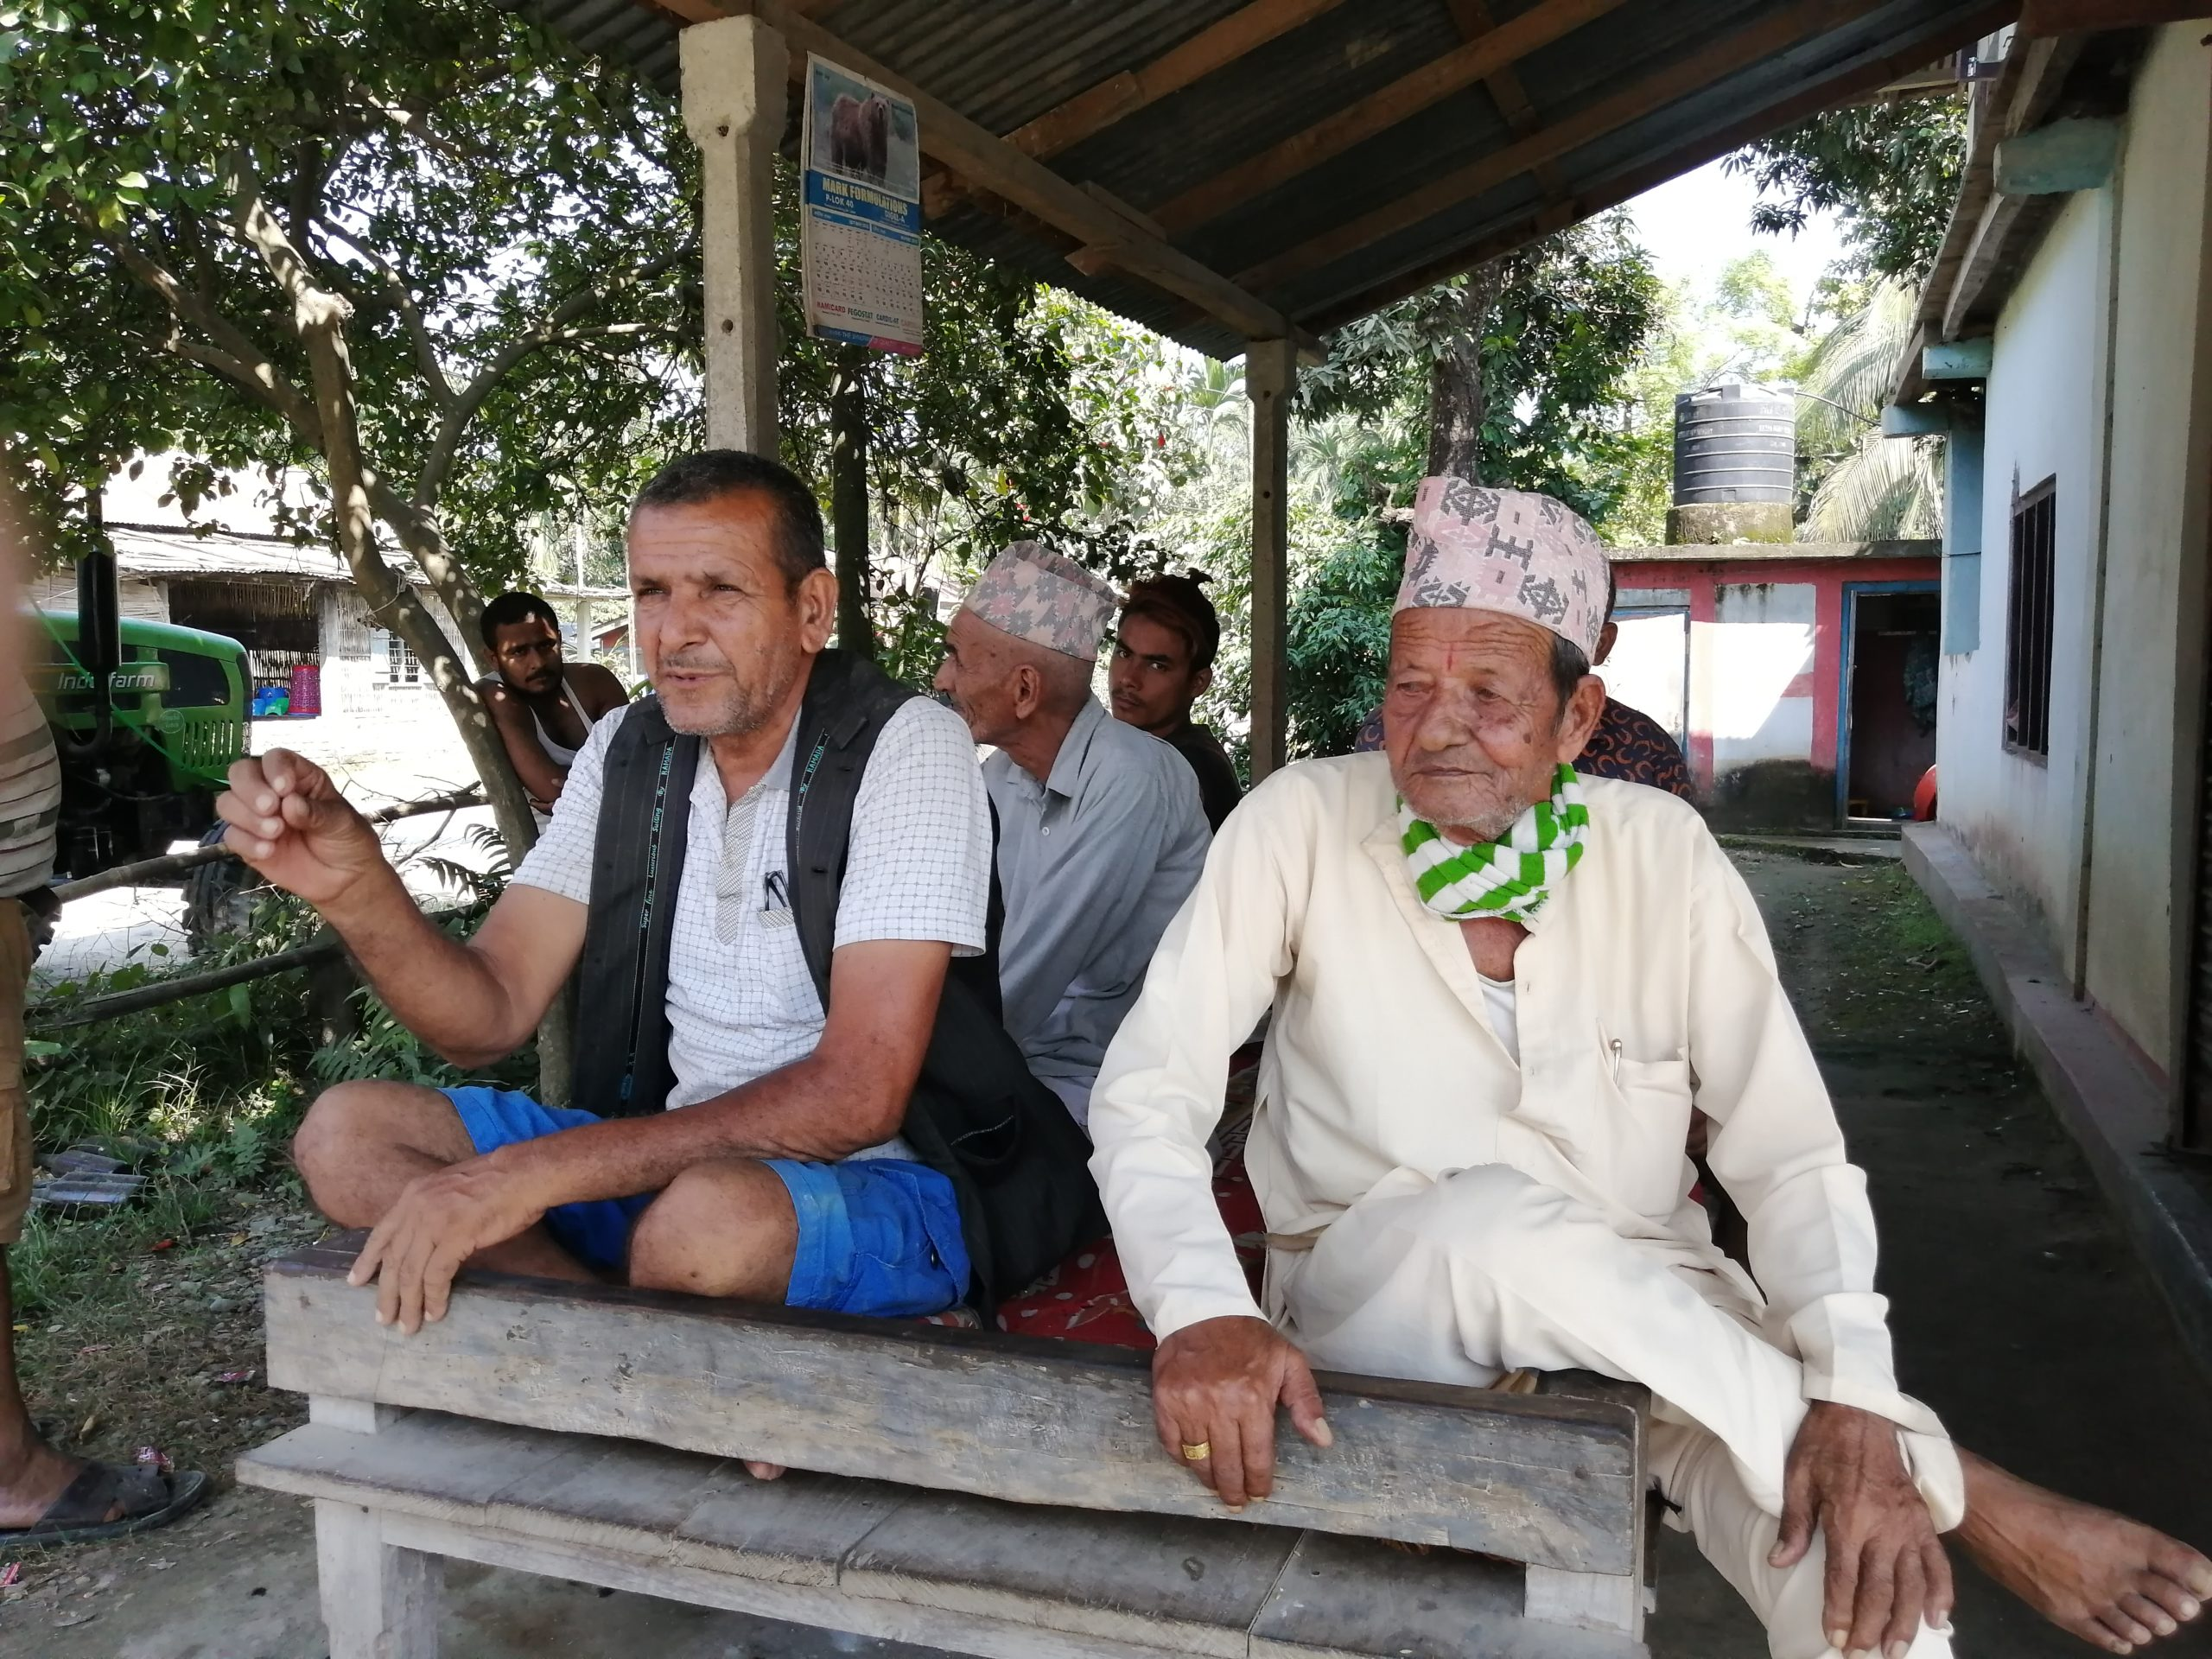 Koshi victims 1968 flood Sunsari Nepal